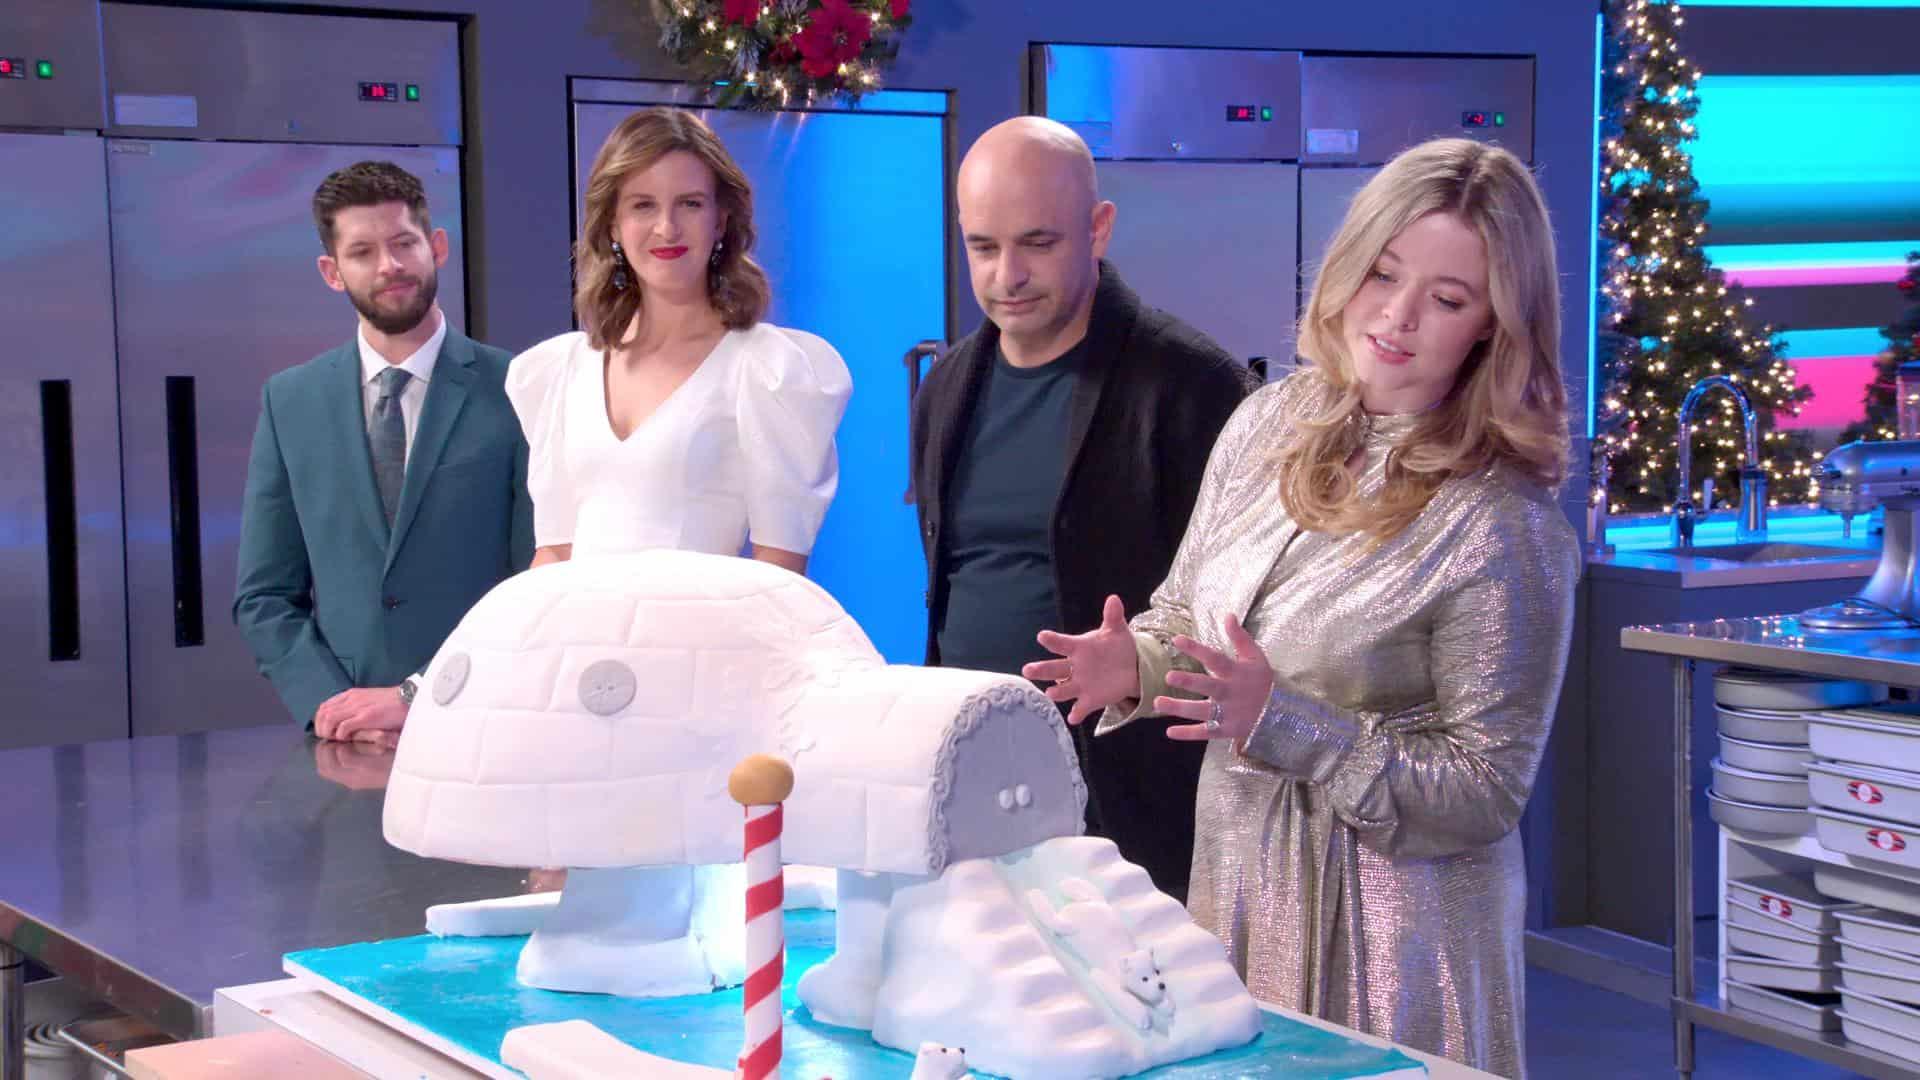 Sugar Rush Christmas: Season 2 -Available November 27